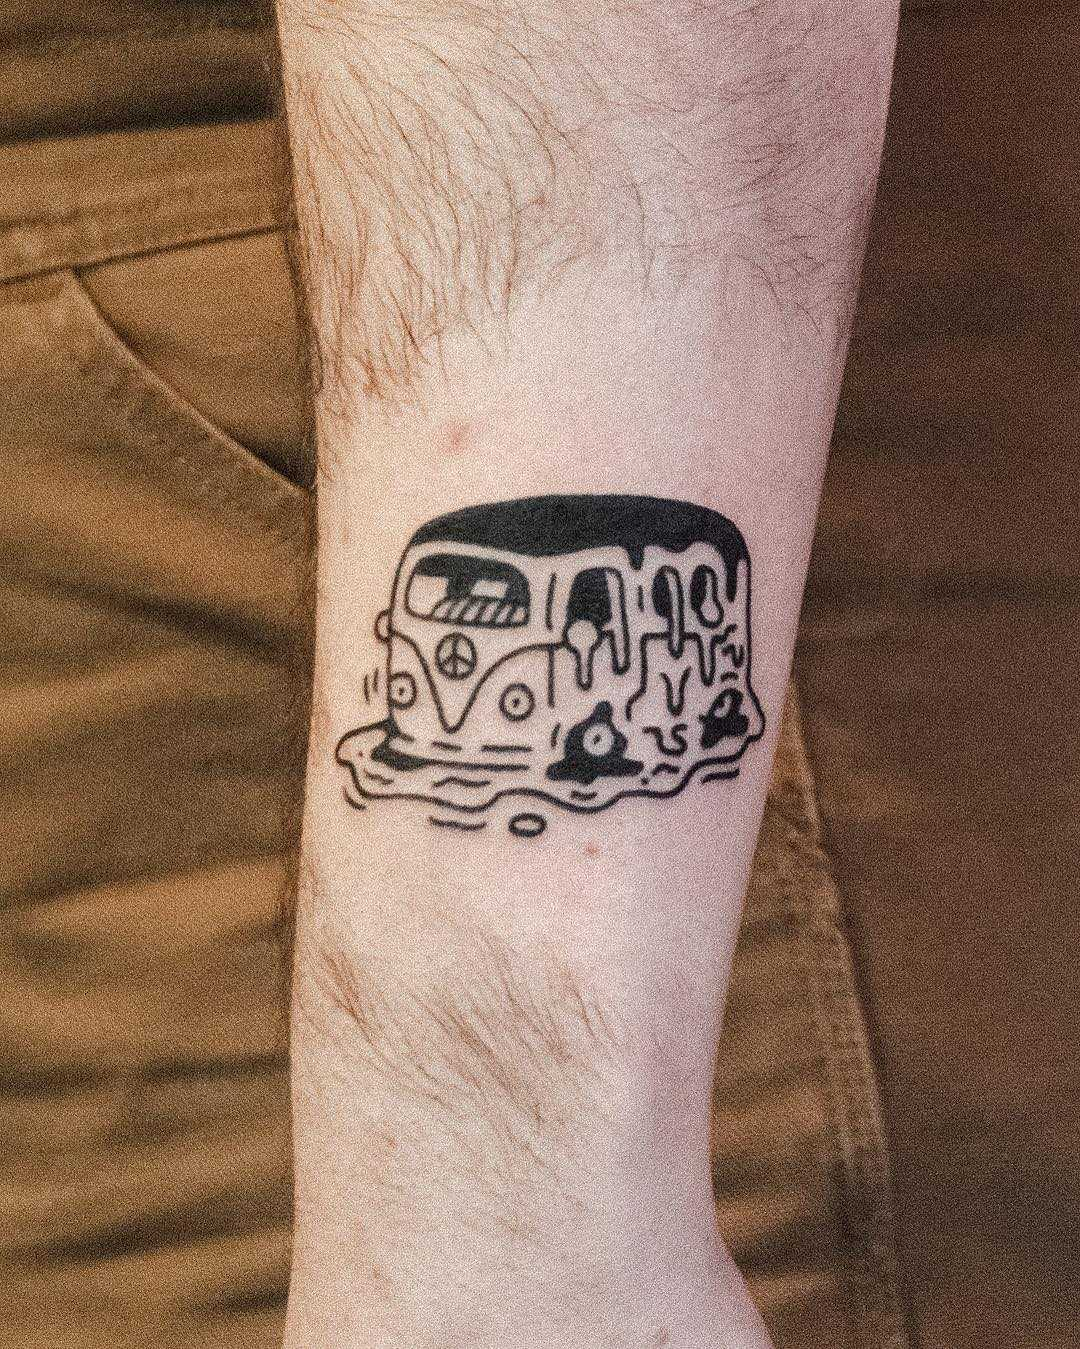 Melting bus tattoo by tattooist Bongkee